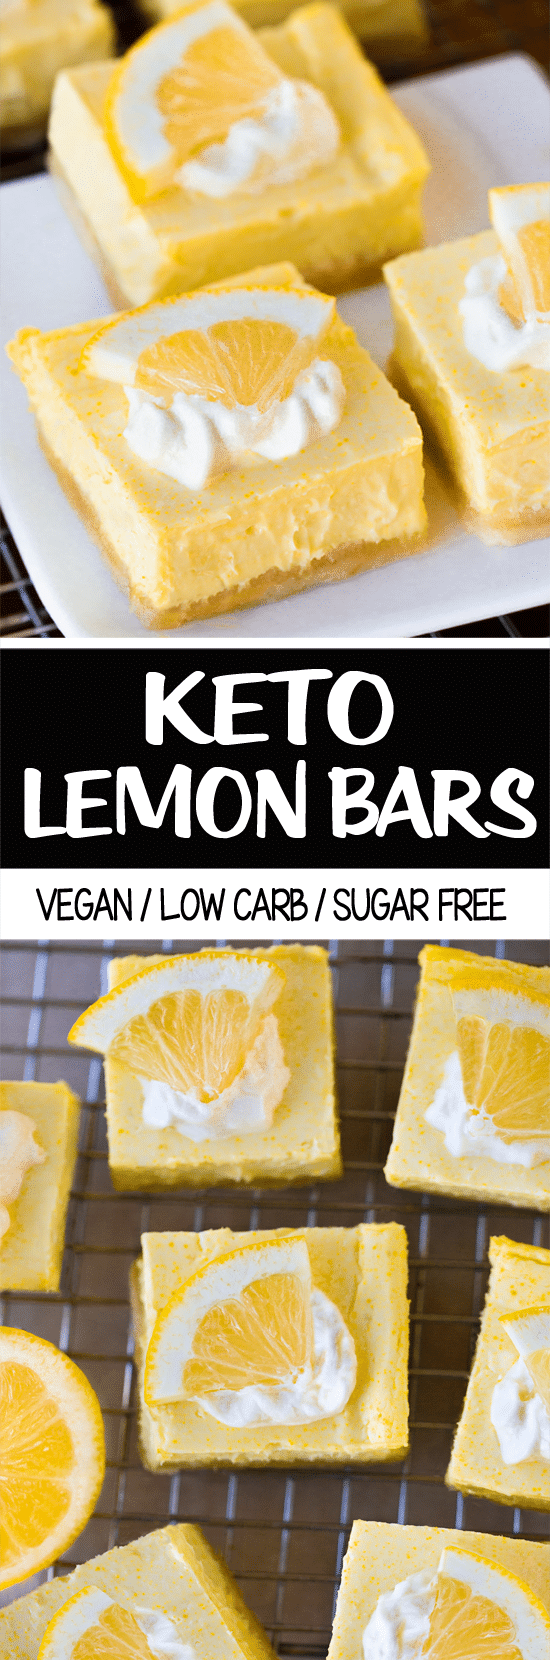 The Best Keto Snack Lemon Bar Recipe Low Carb